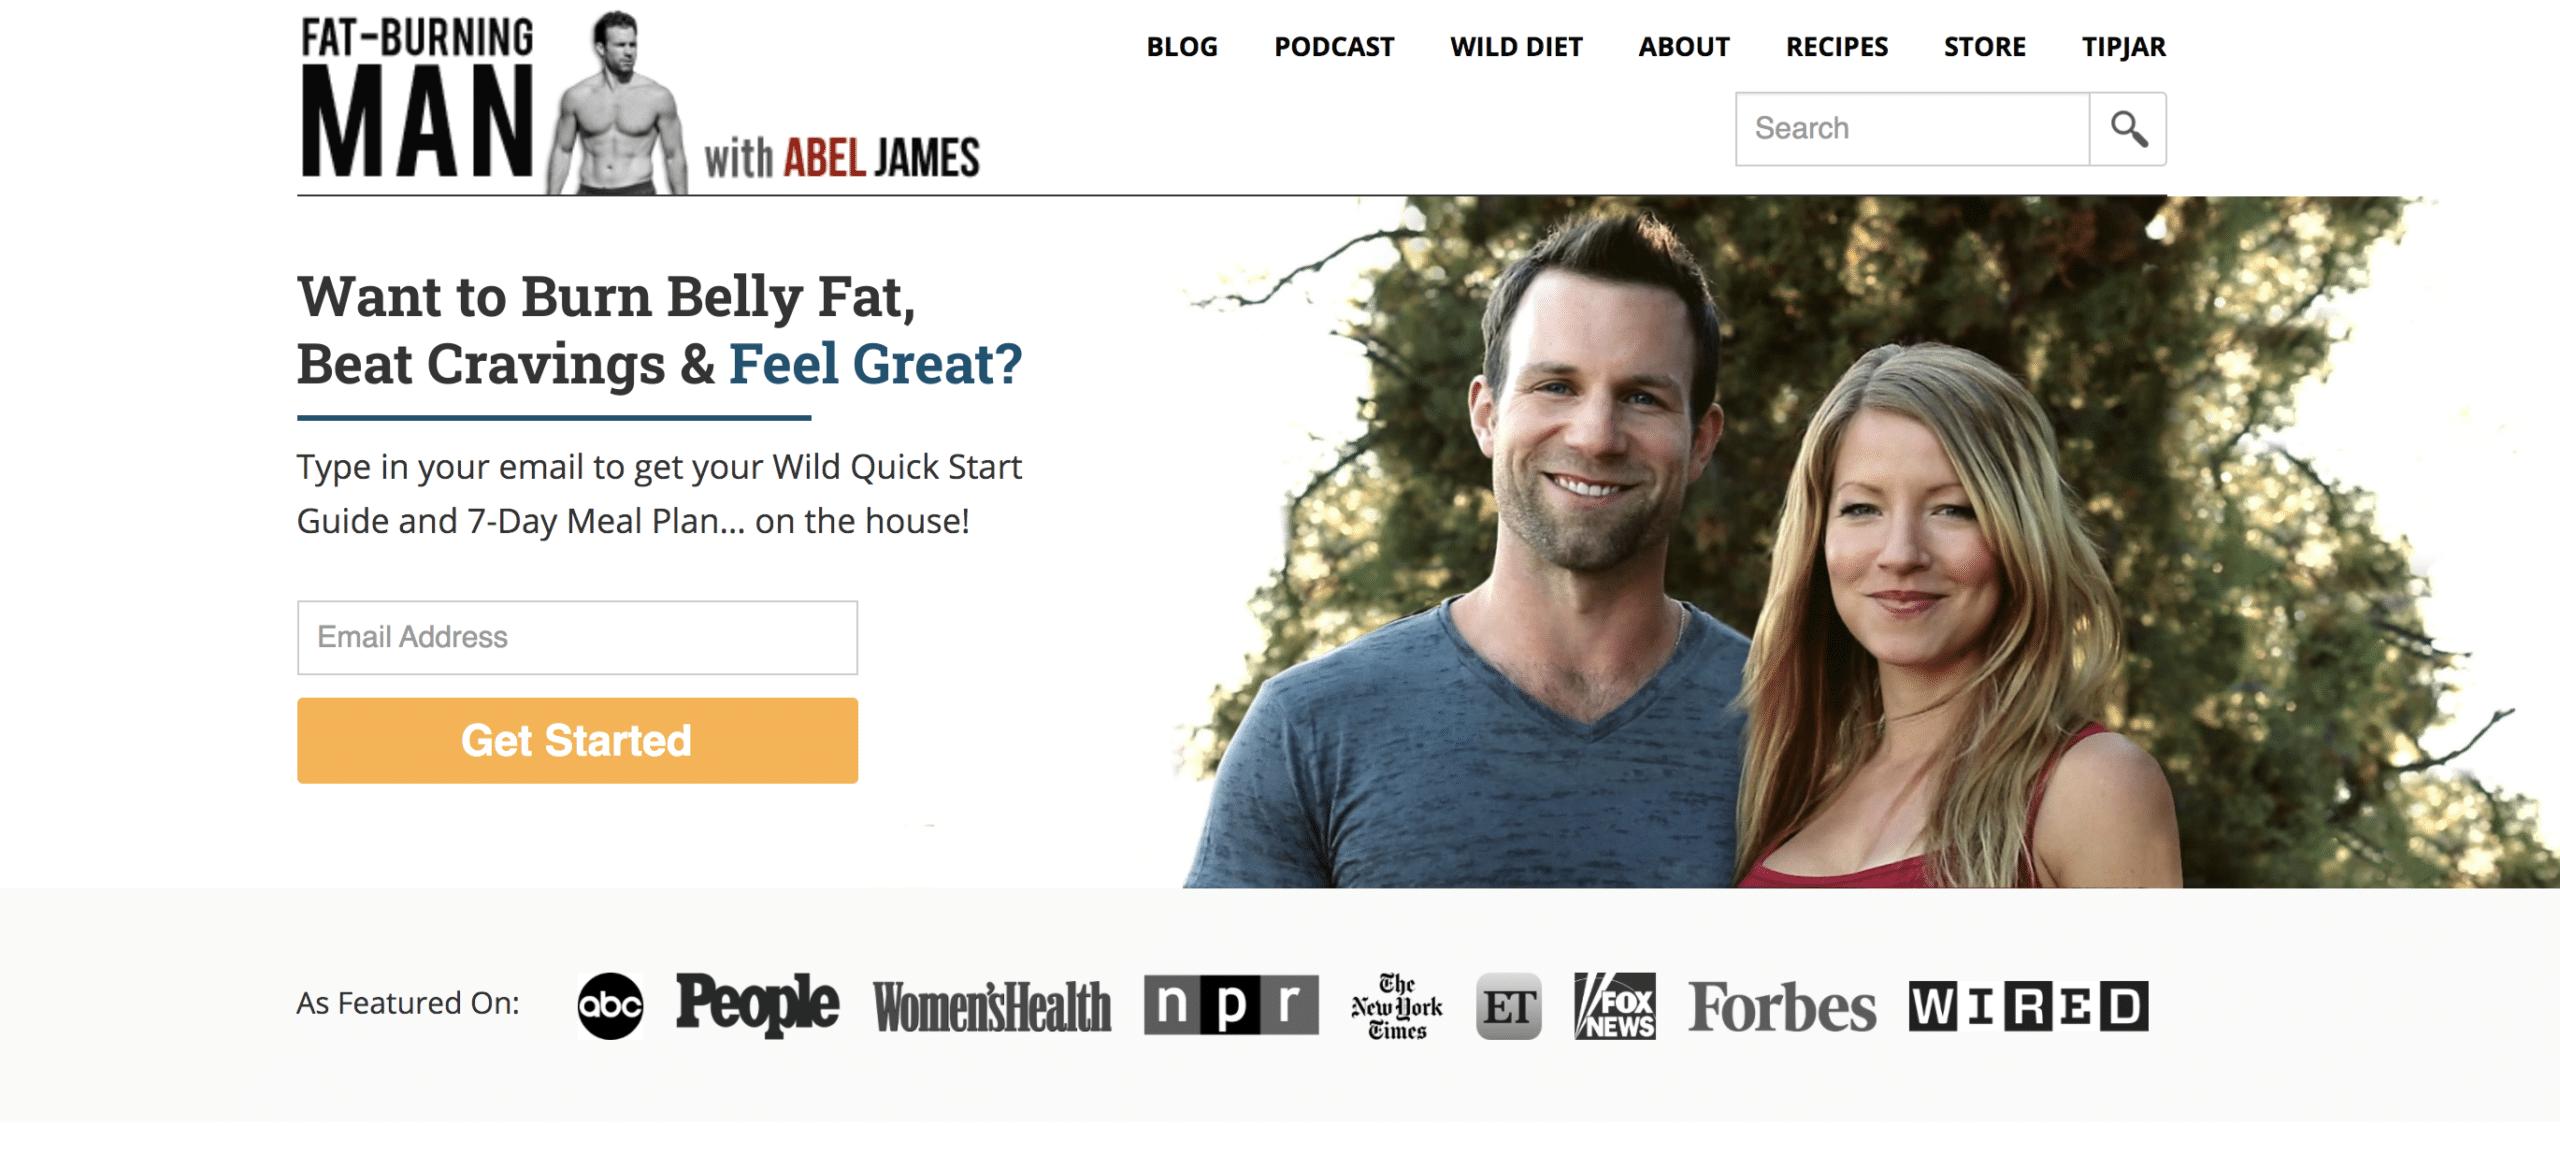 fat burning man fitness blog homepage